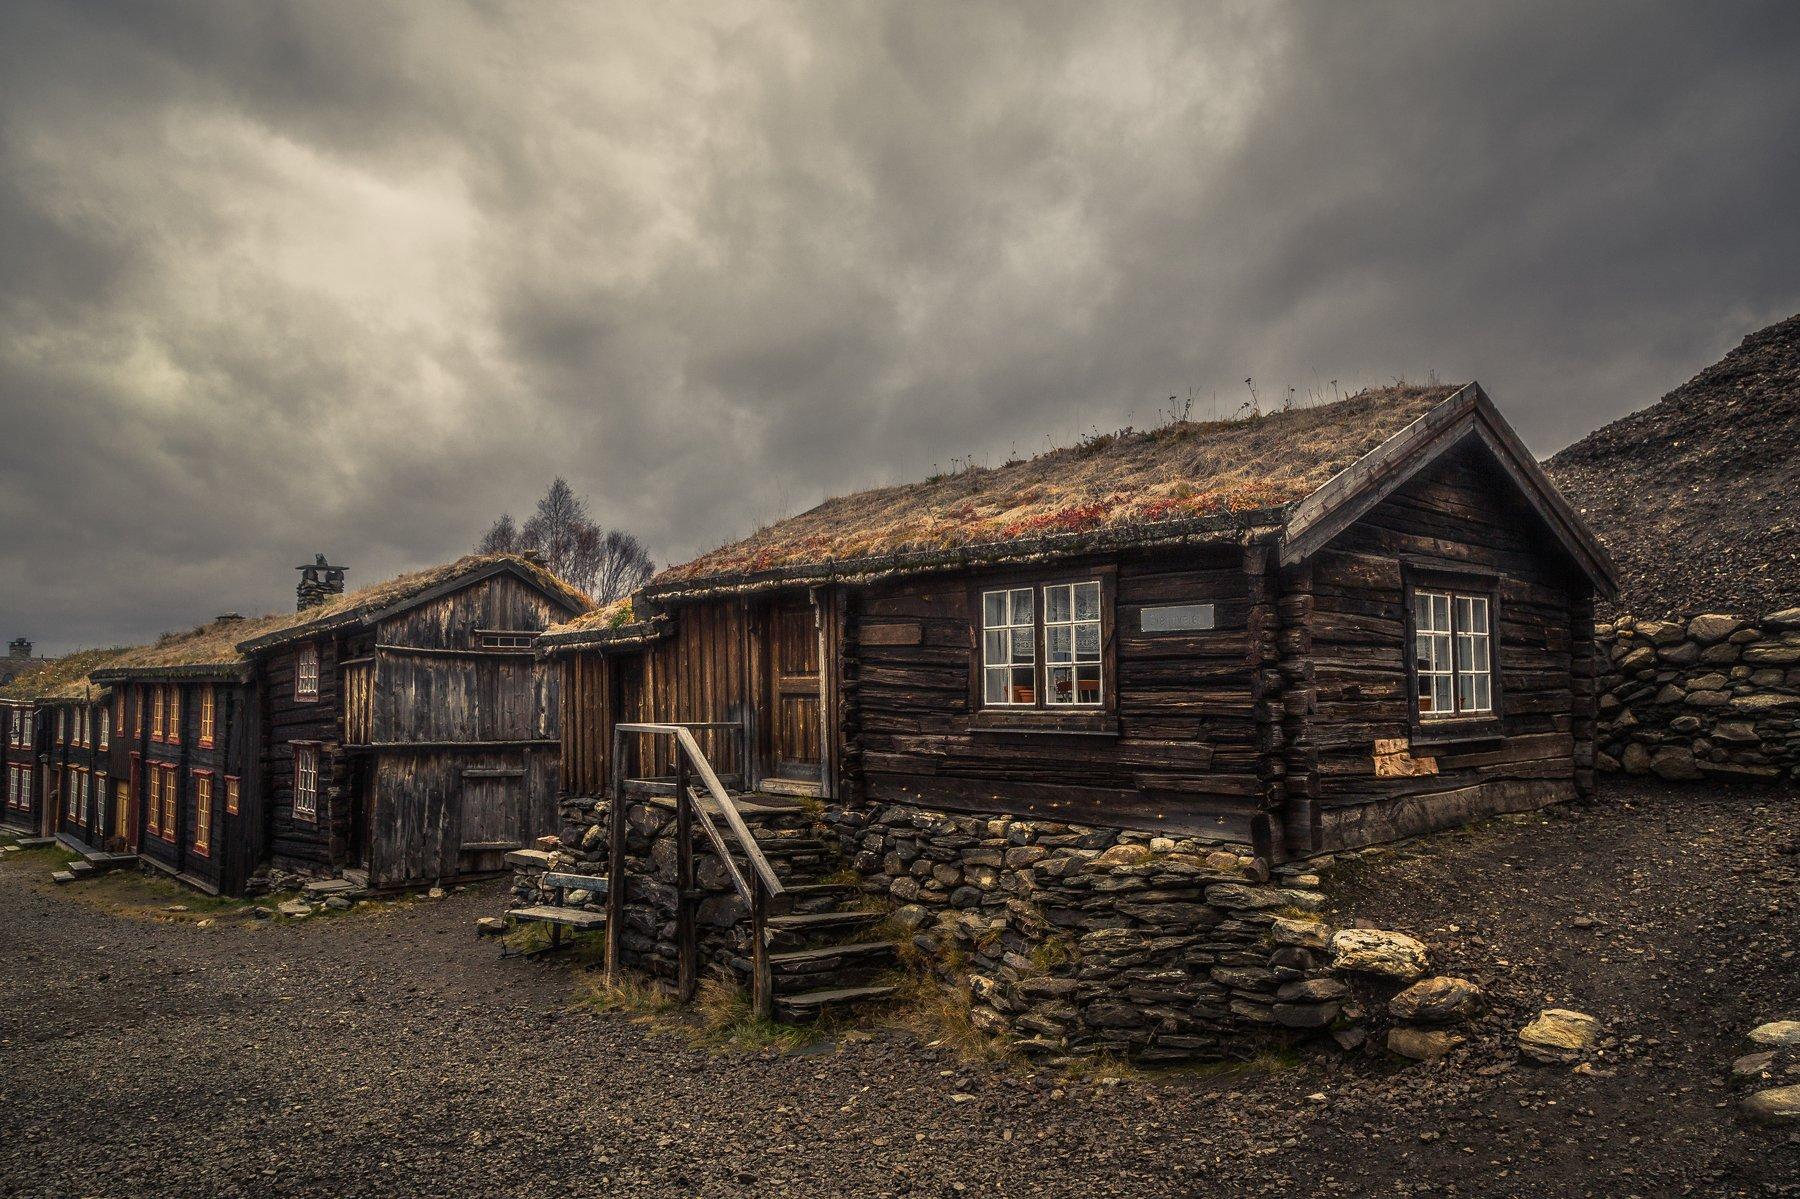 røros,norway,norwegian,mining town,houses,architecture,wooden,house,building,original,moody,unesco, Szatewicz Adrian